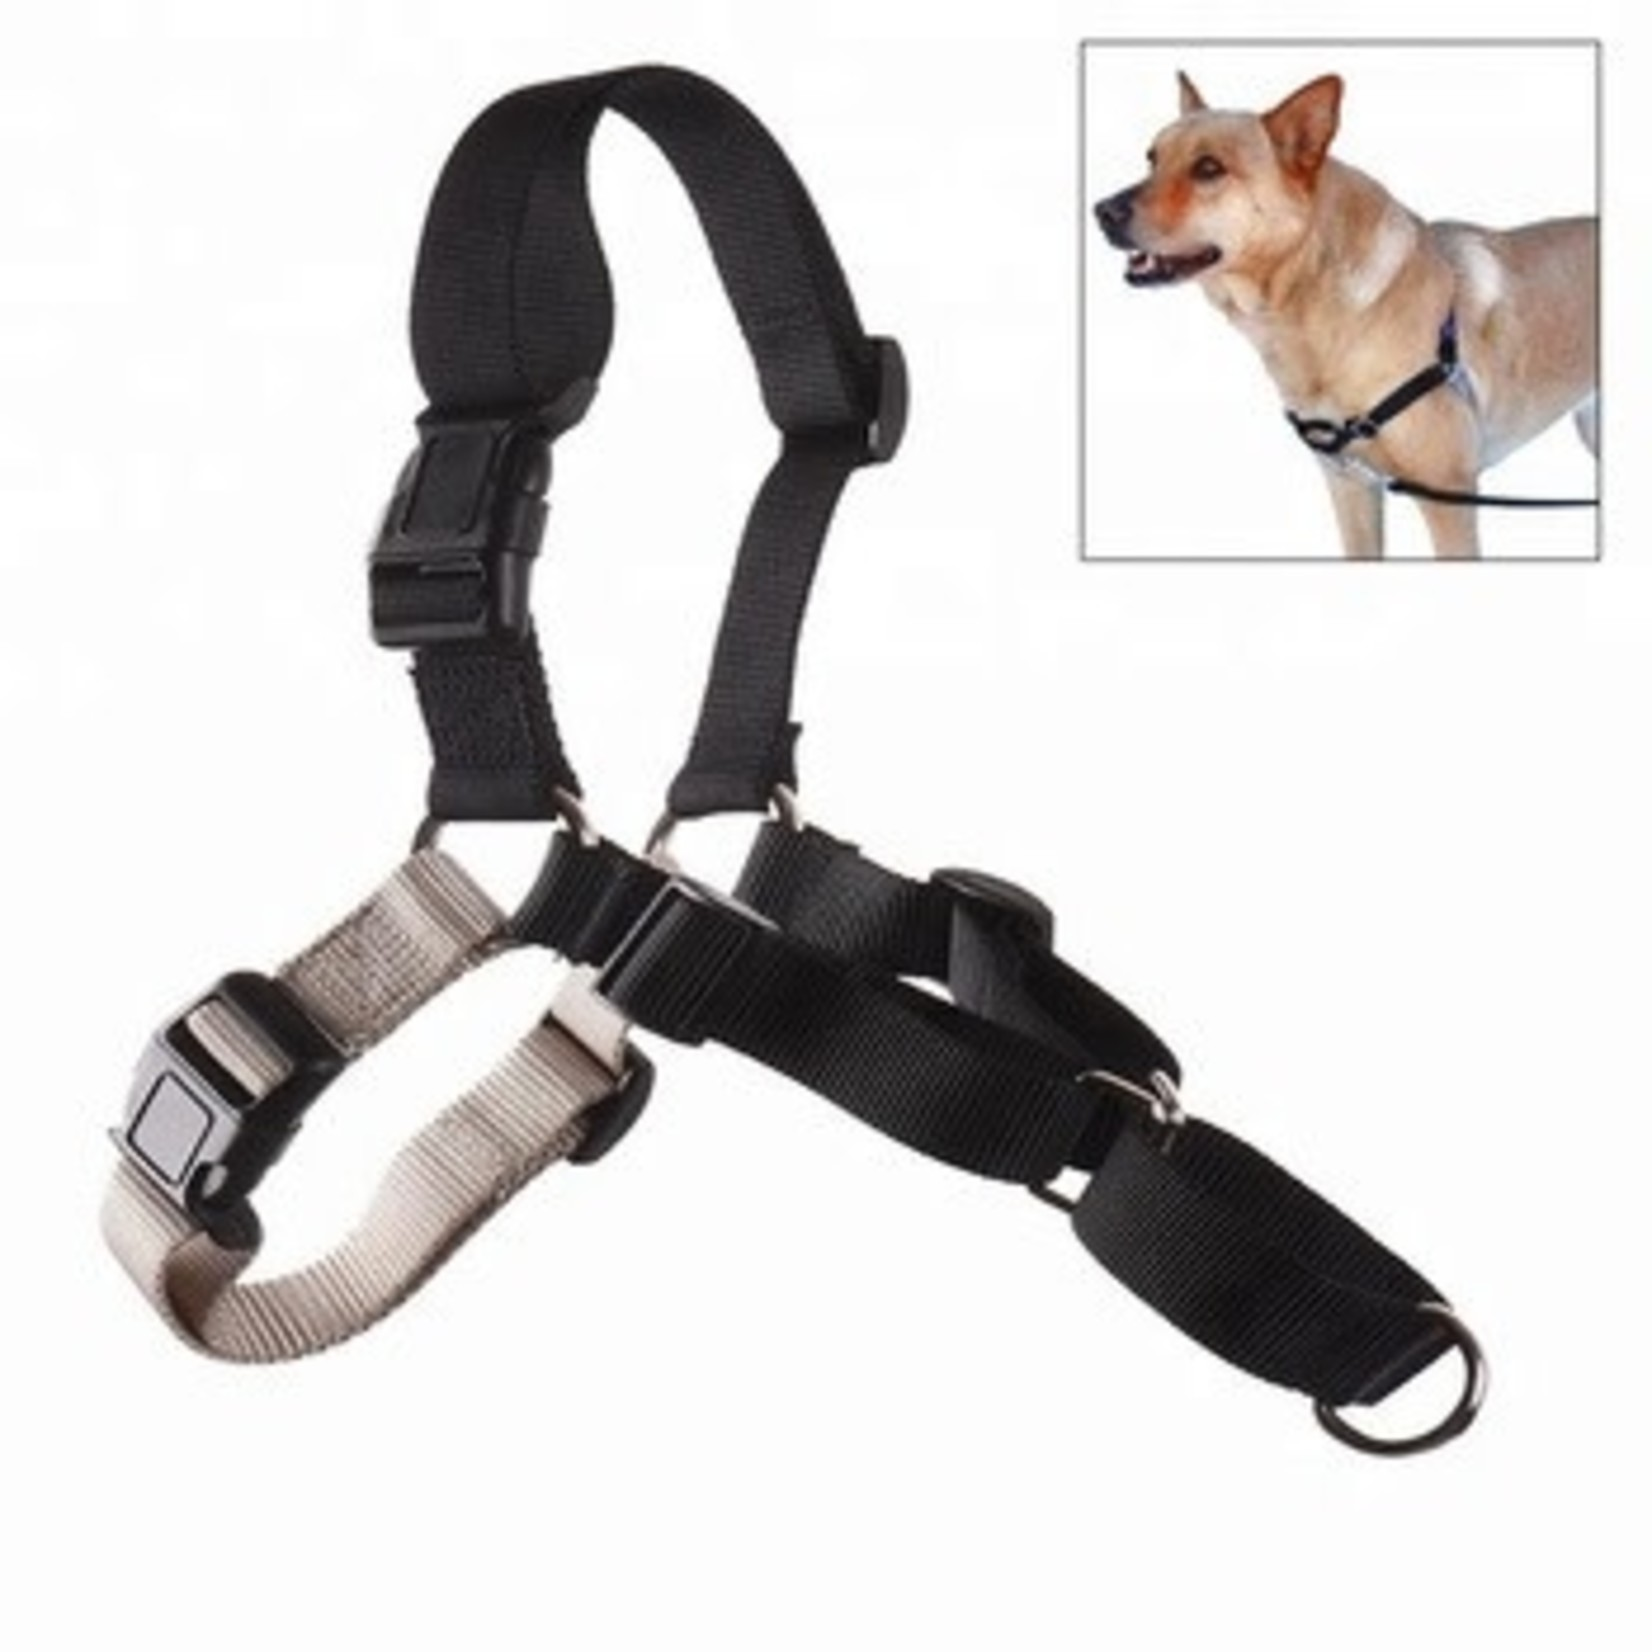 Pet Safe / Radio Systems Corp. Easy Walk Harness Black Petite/Small